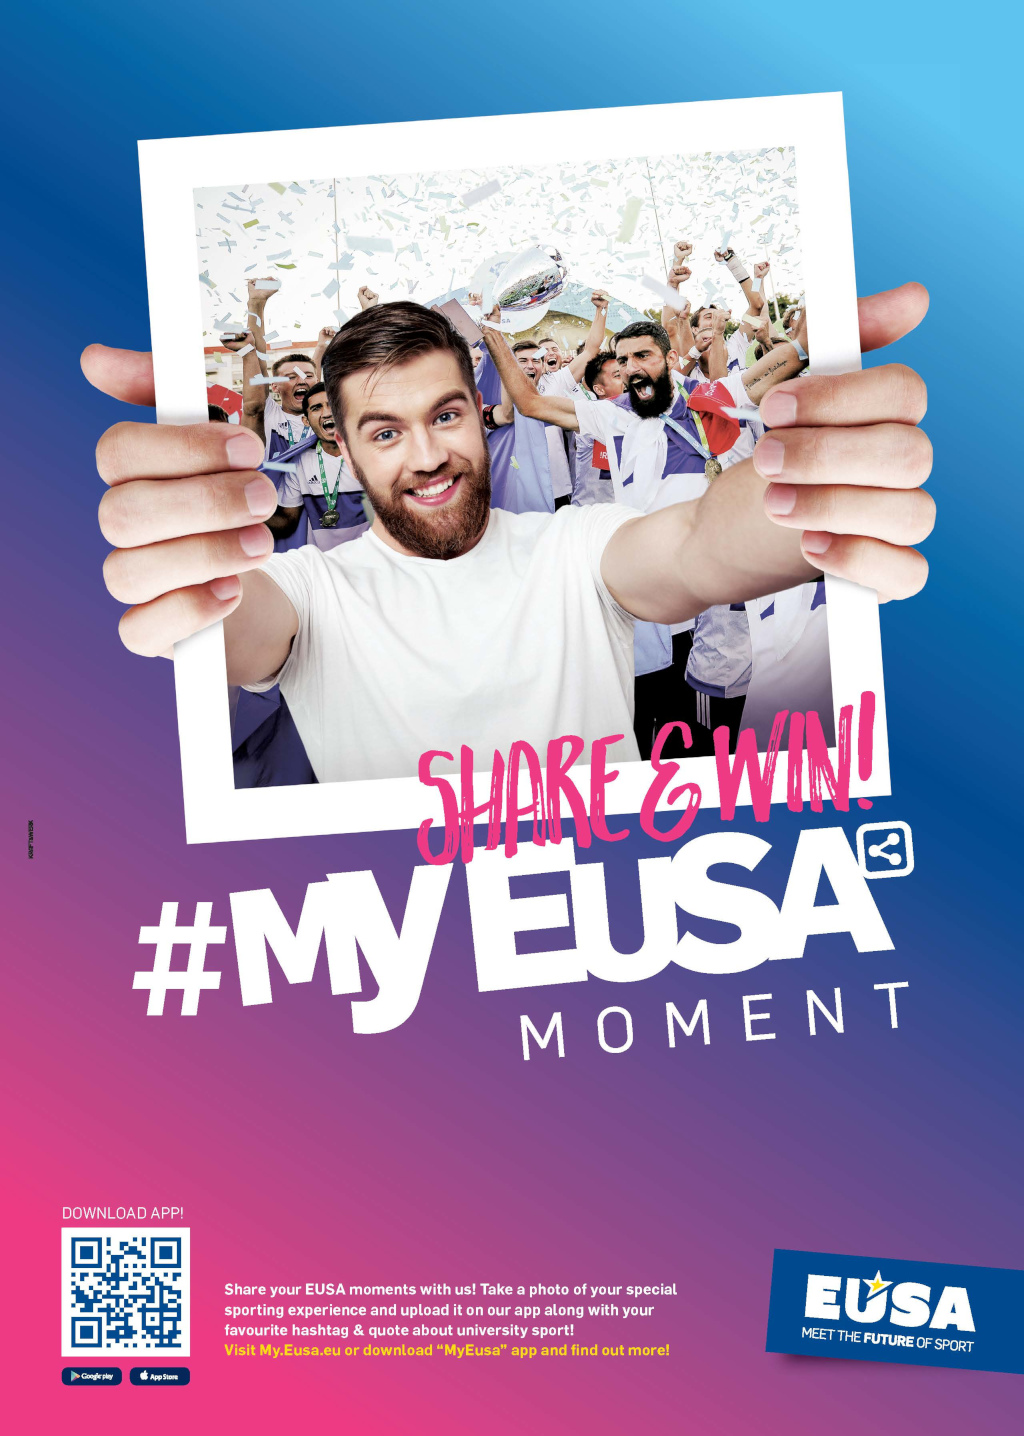 Introducing new #Myeusa campaign and app | EUSA